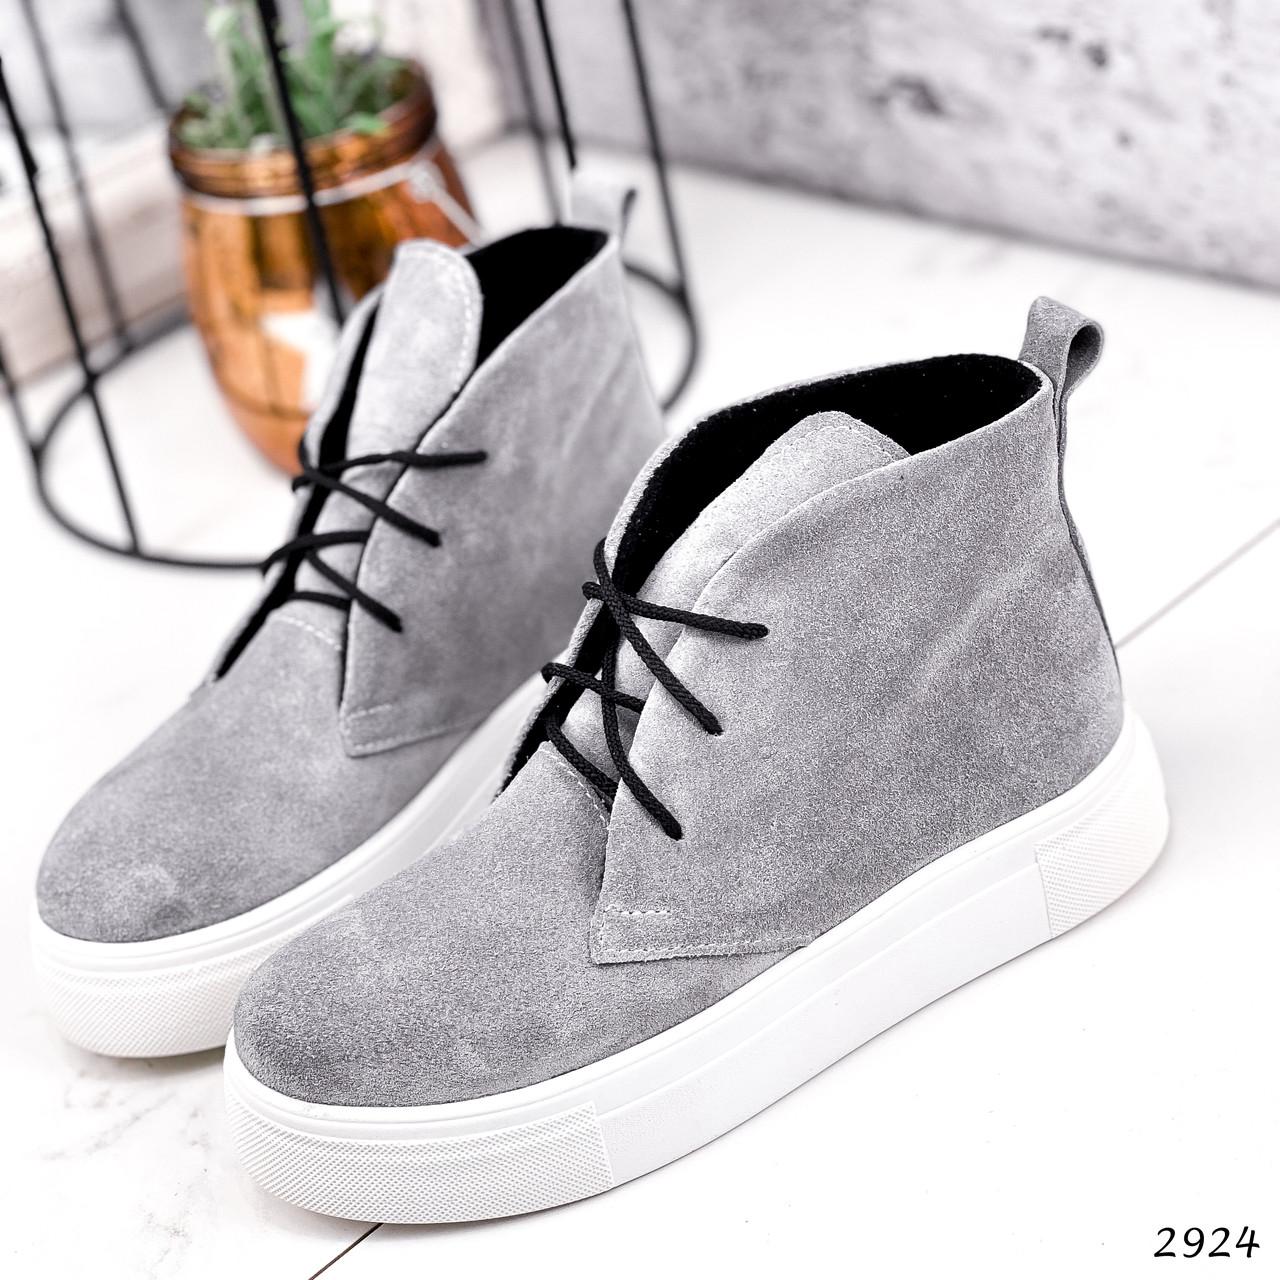 Ботинки женские Tad серые 2924